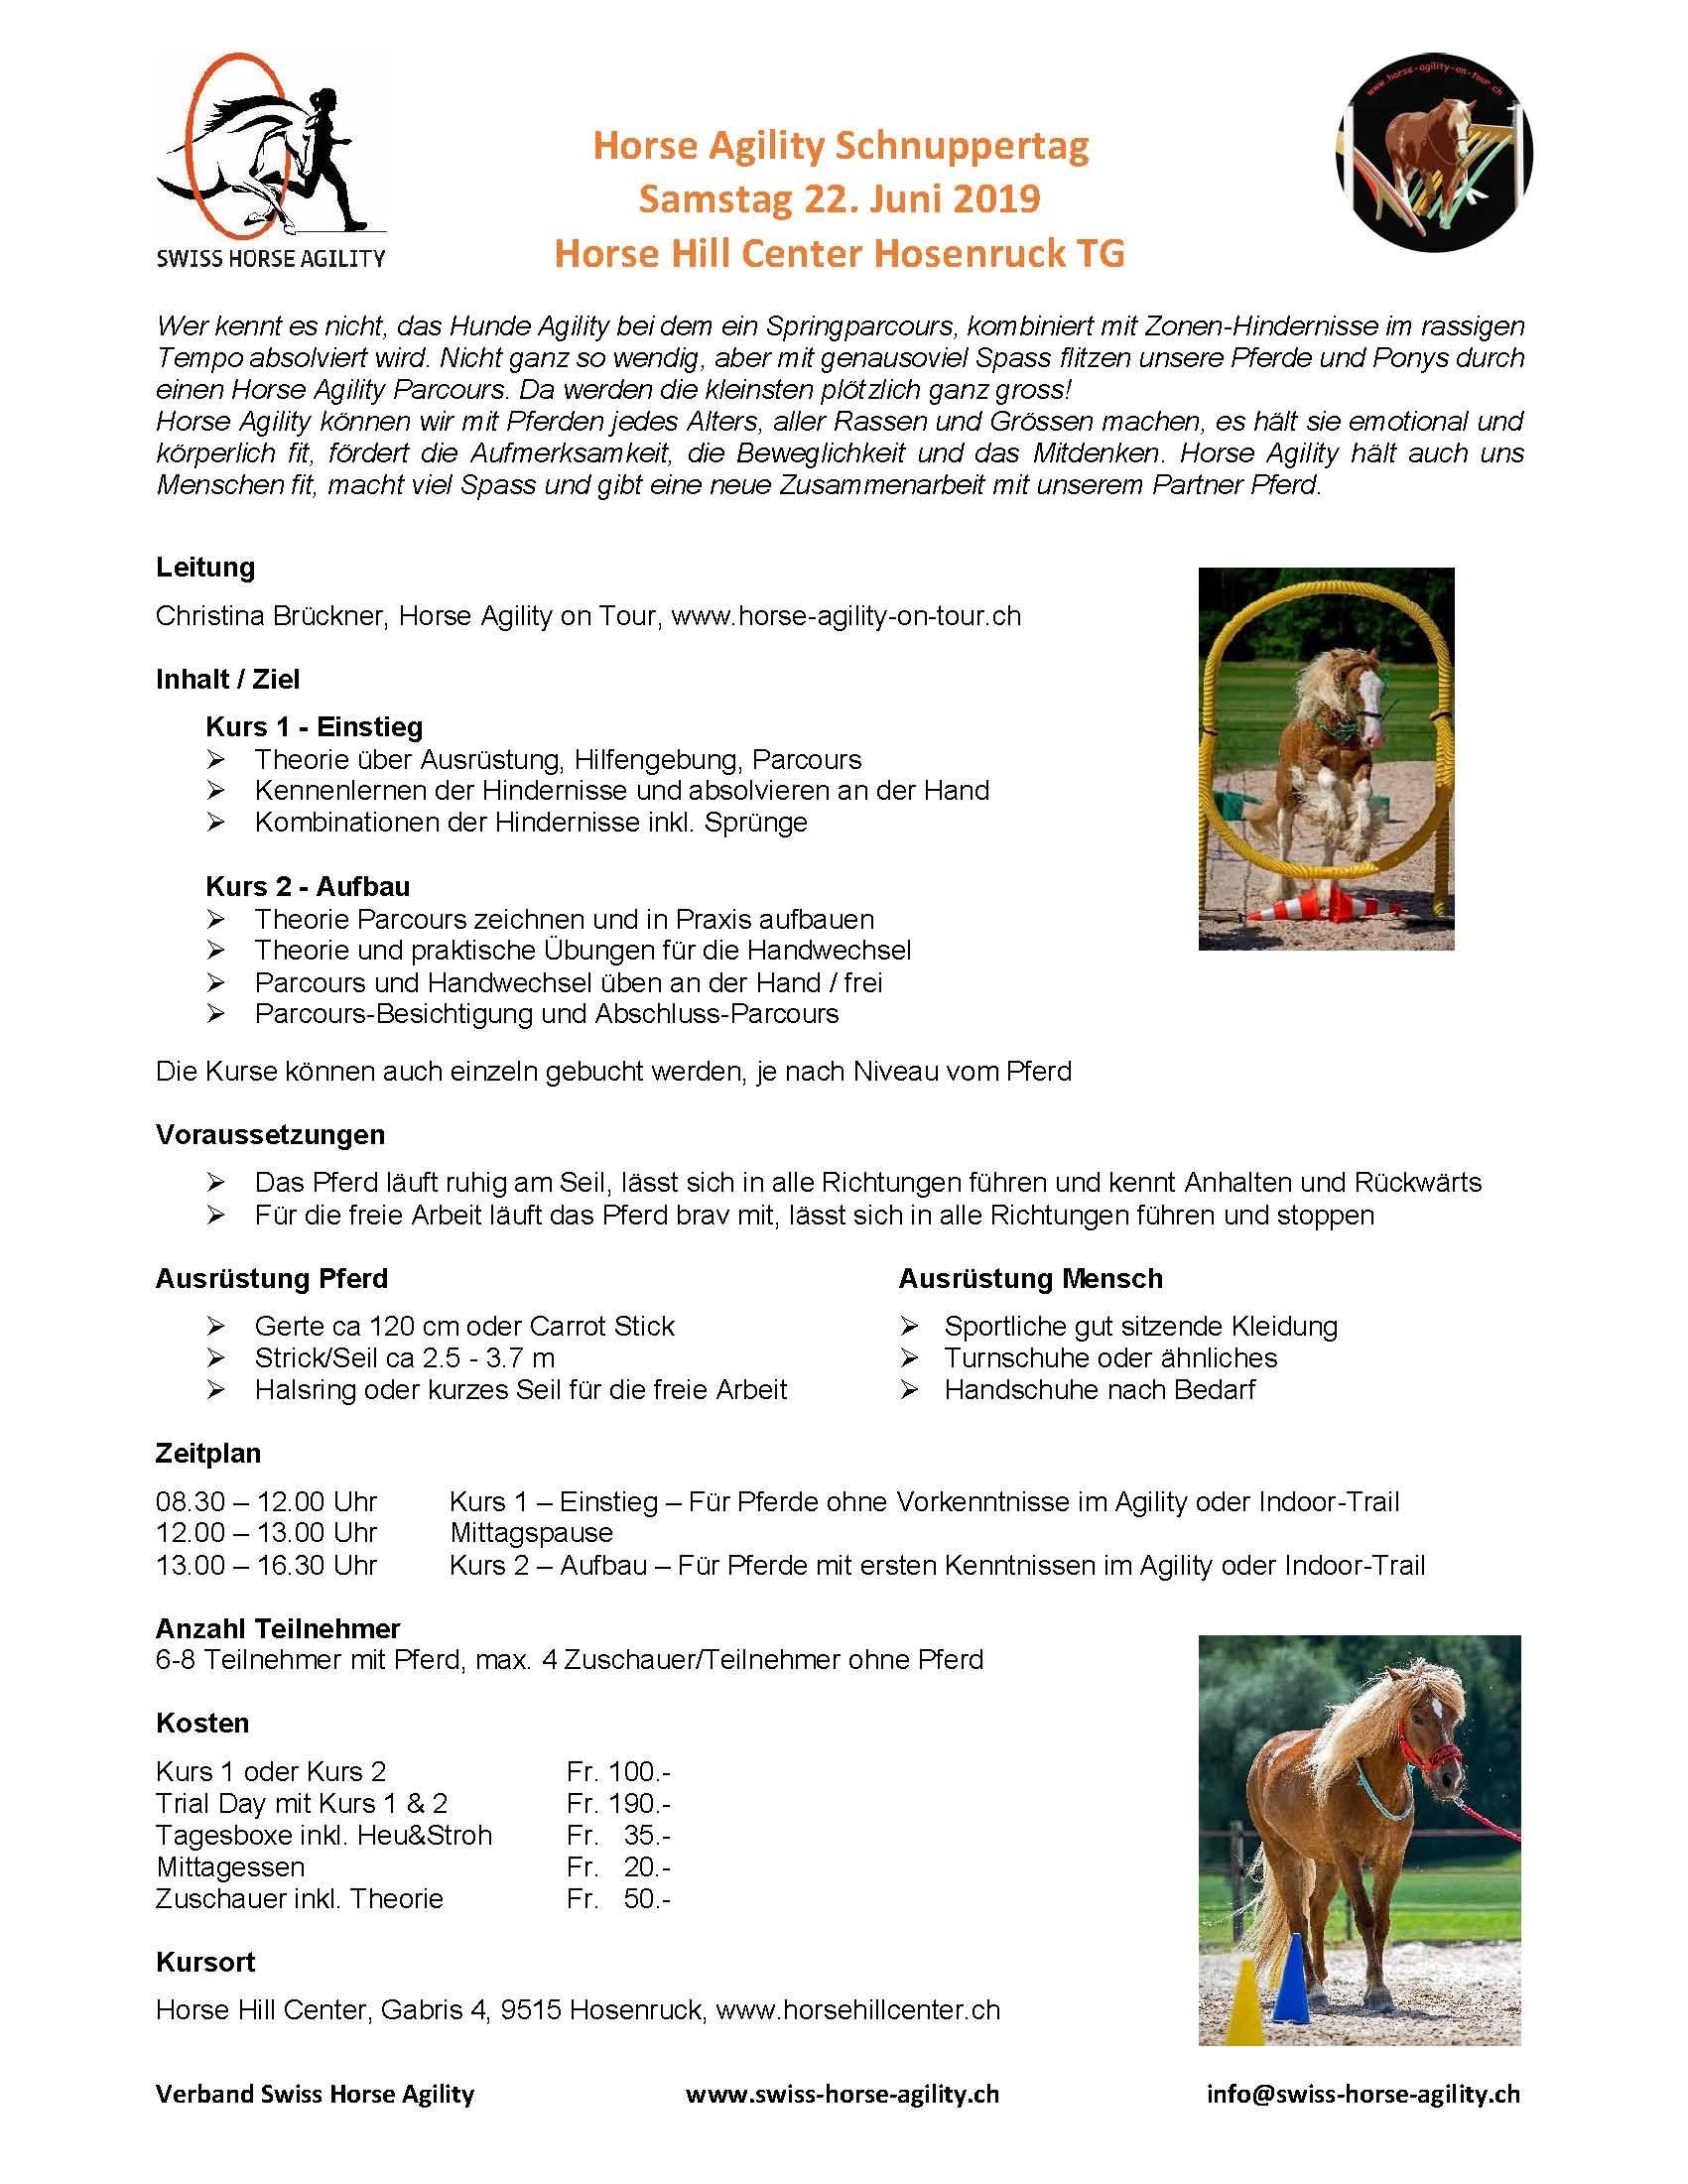 Horse Agility Schnuppertag Horsehillcenter TG Swiss Horse